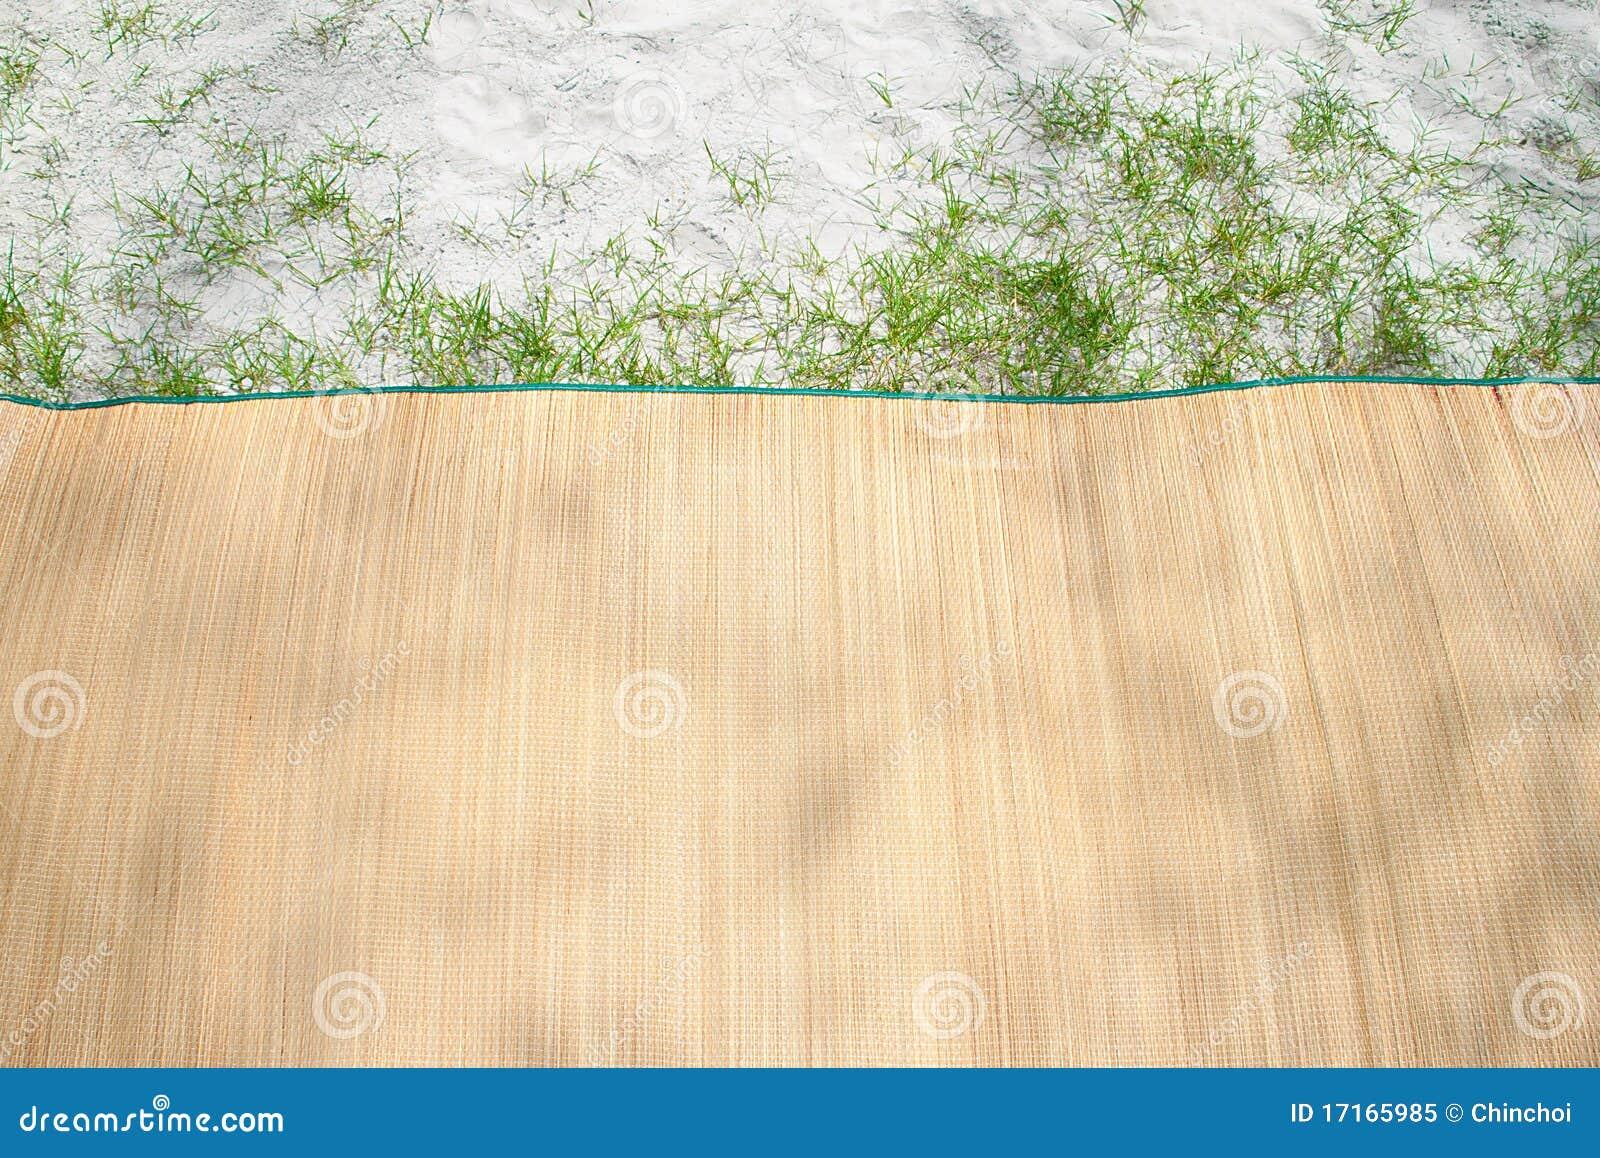 couvre tapis en bambou sur la plage image stock image du. Black Bedroom Furniture Sets. Home Design Ideas